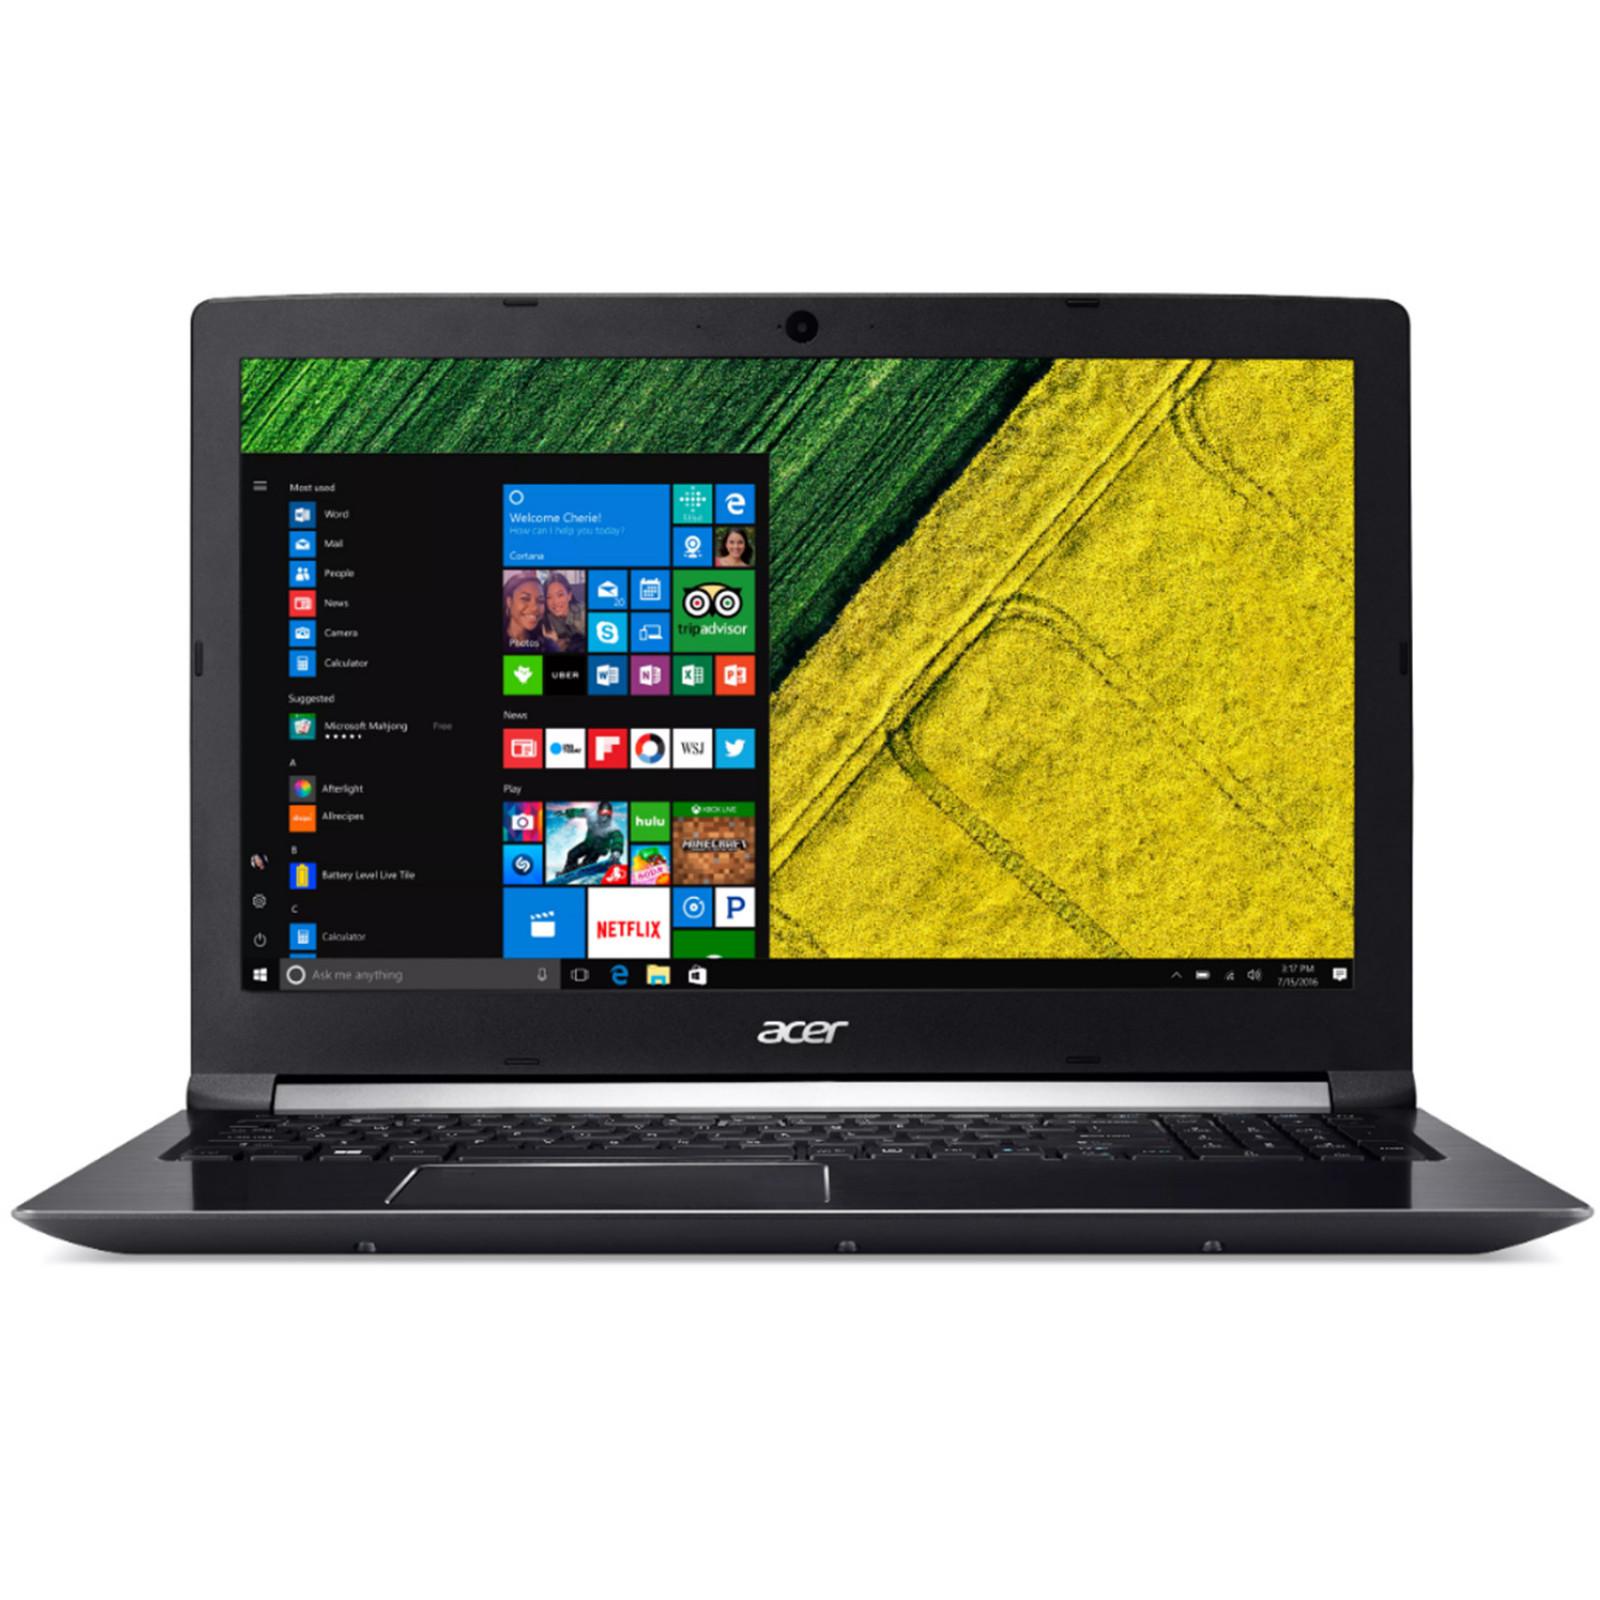 Buy the Acer Aspire 7 GTX 1050 Ti Gaming Laptop 15 6